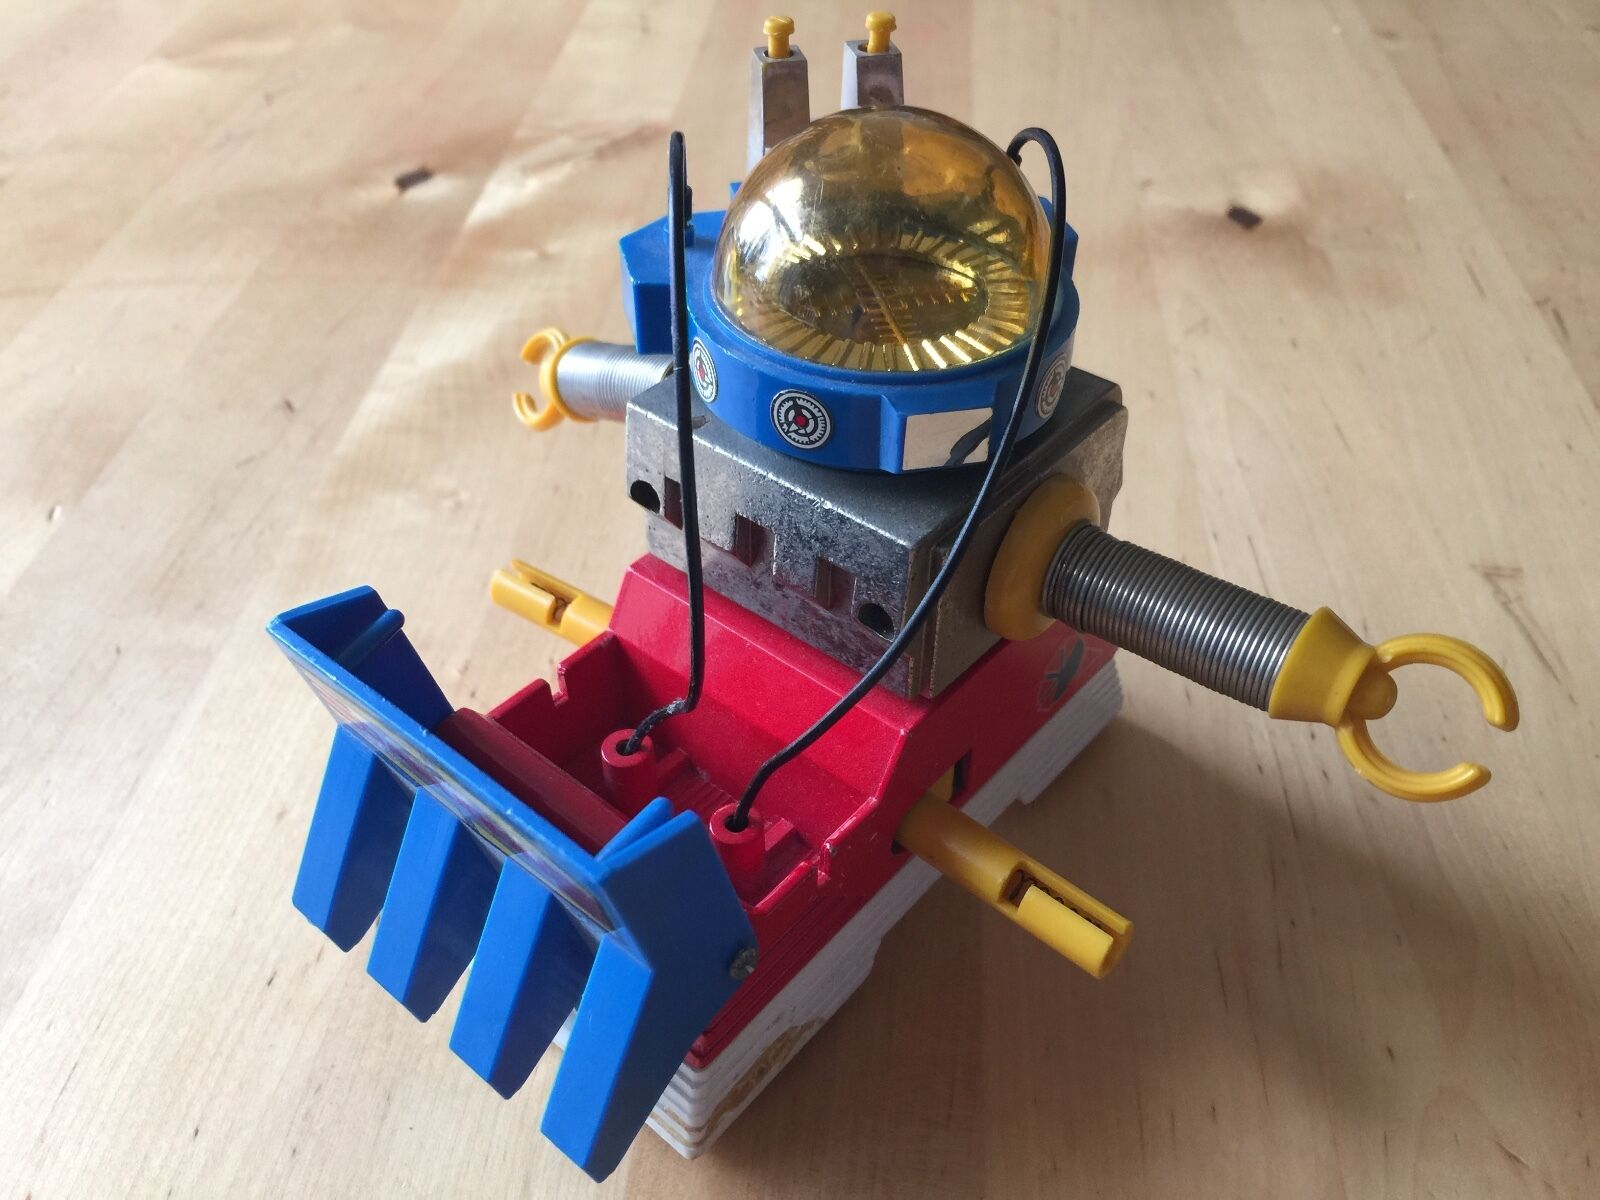 Takatoku y&k loose Z-Gokin Robot Die Cast Daburon aventure famille Japon